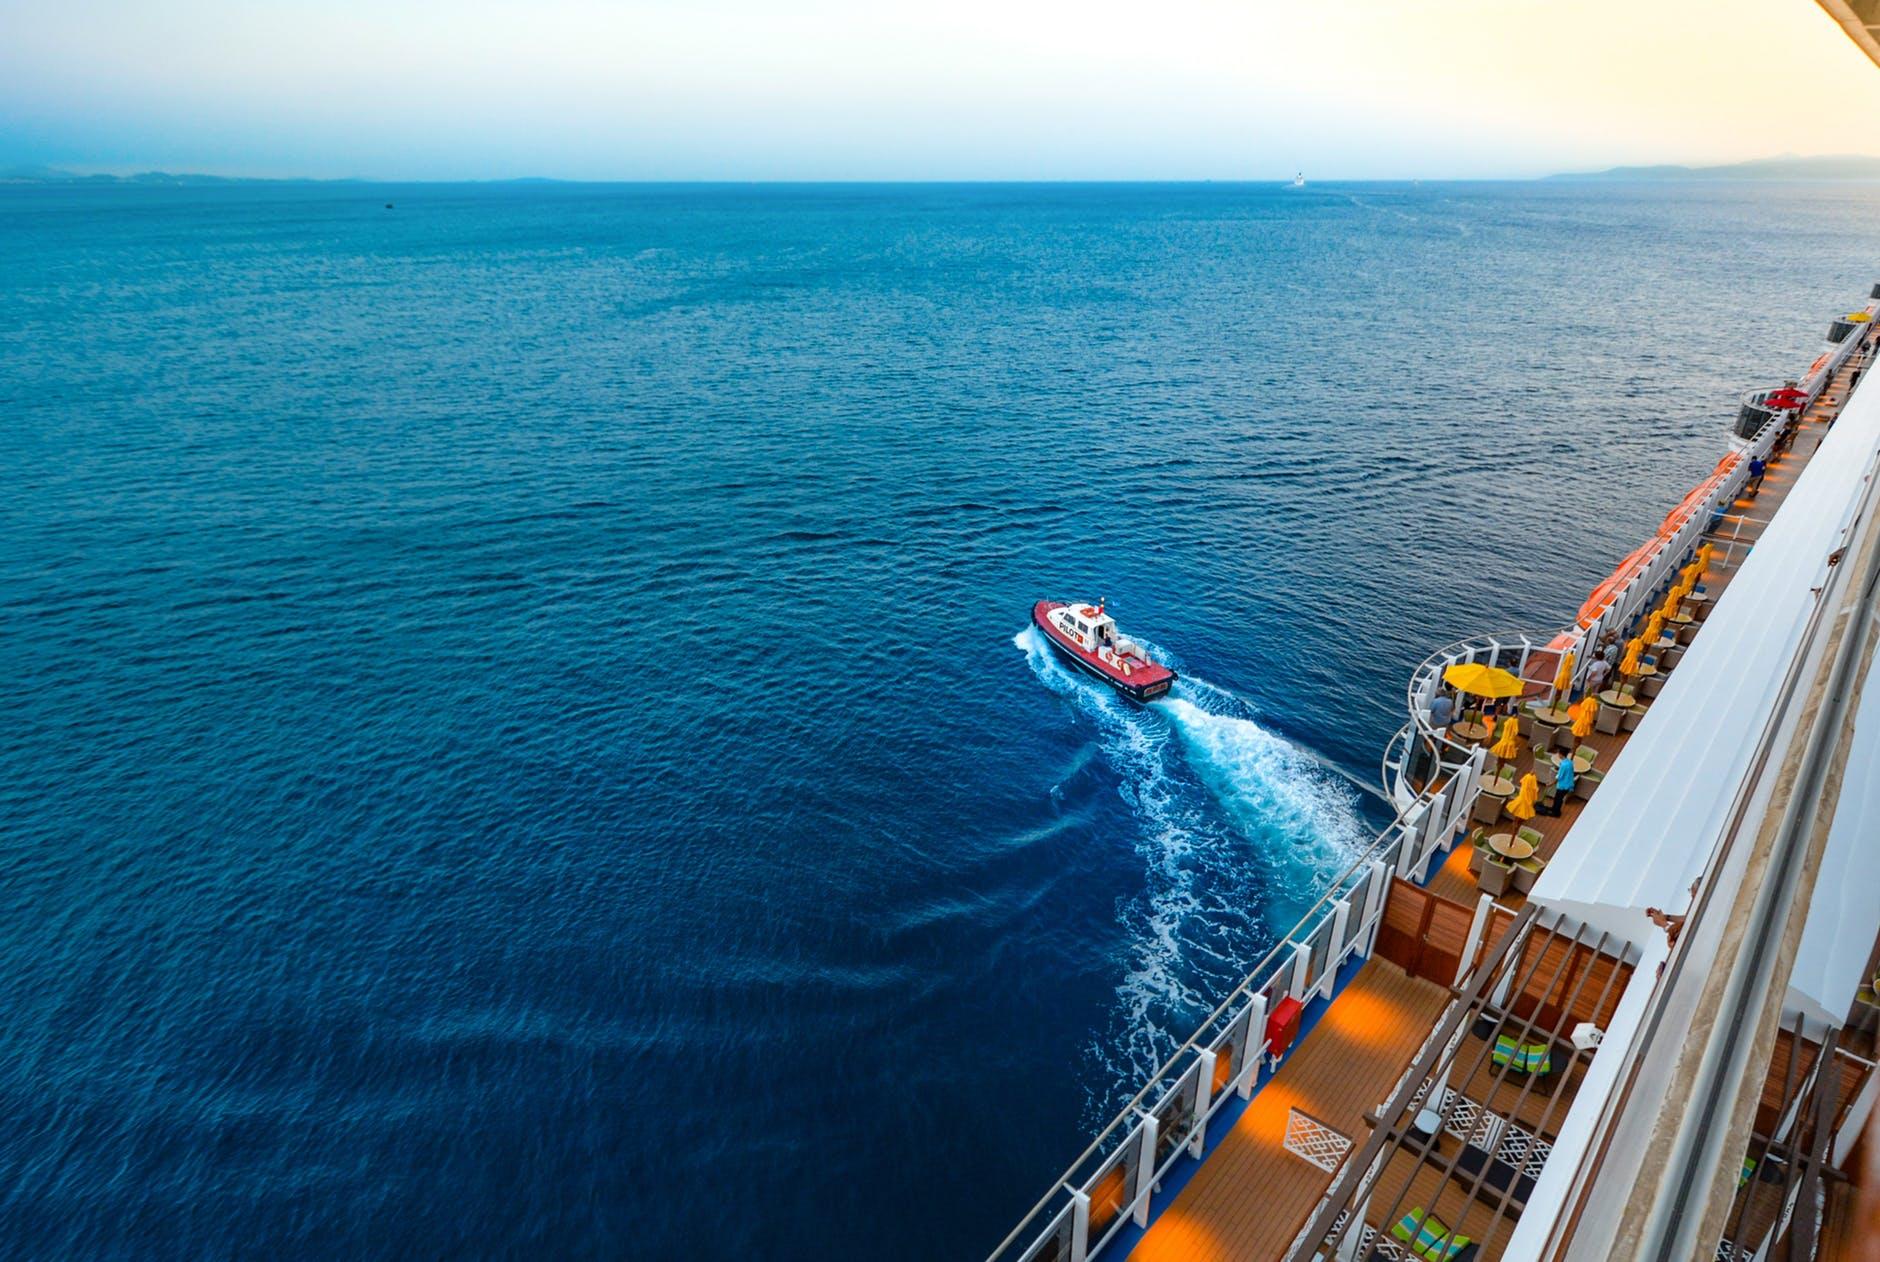 outboard motor news - Earrow Outboard